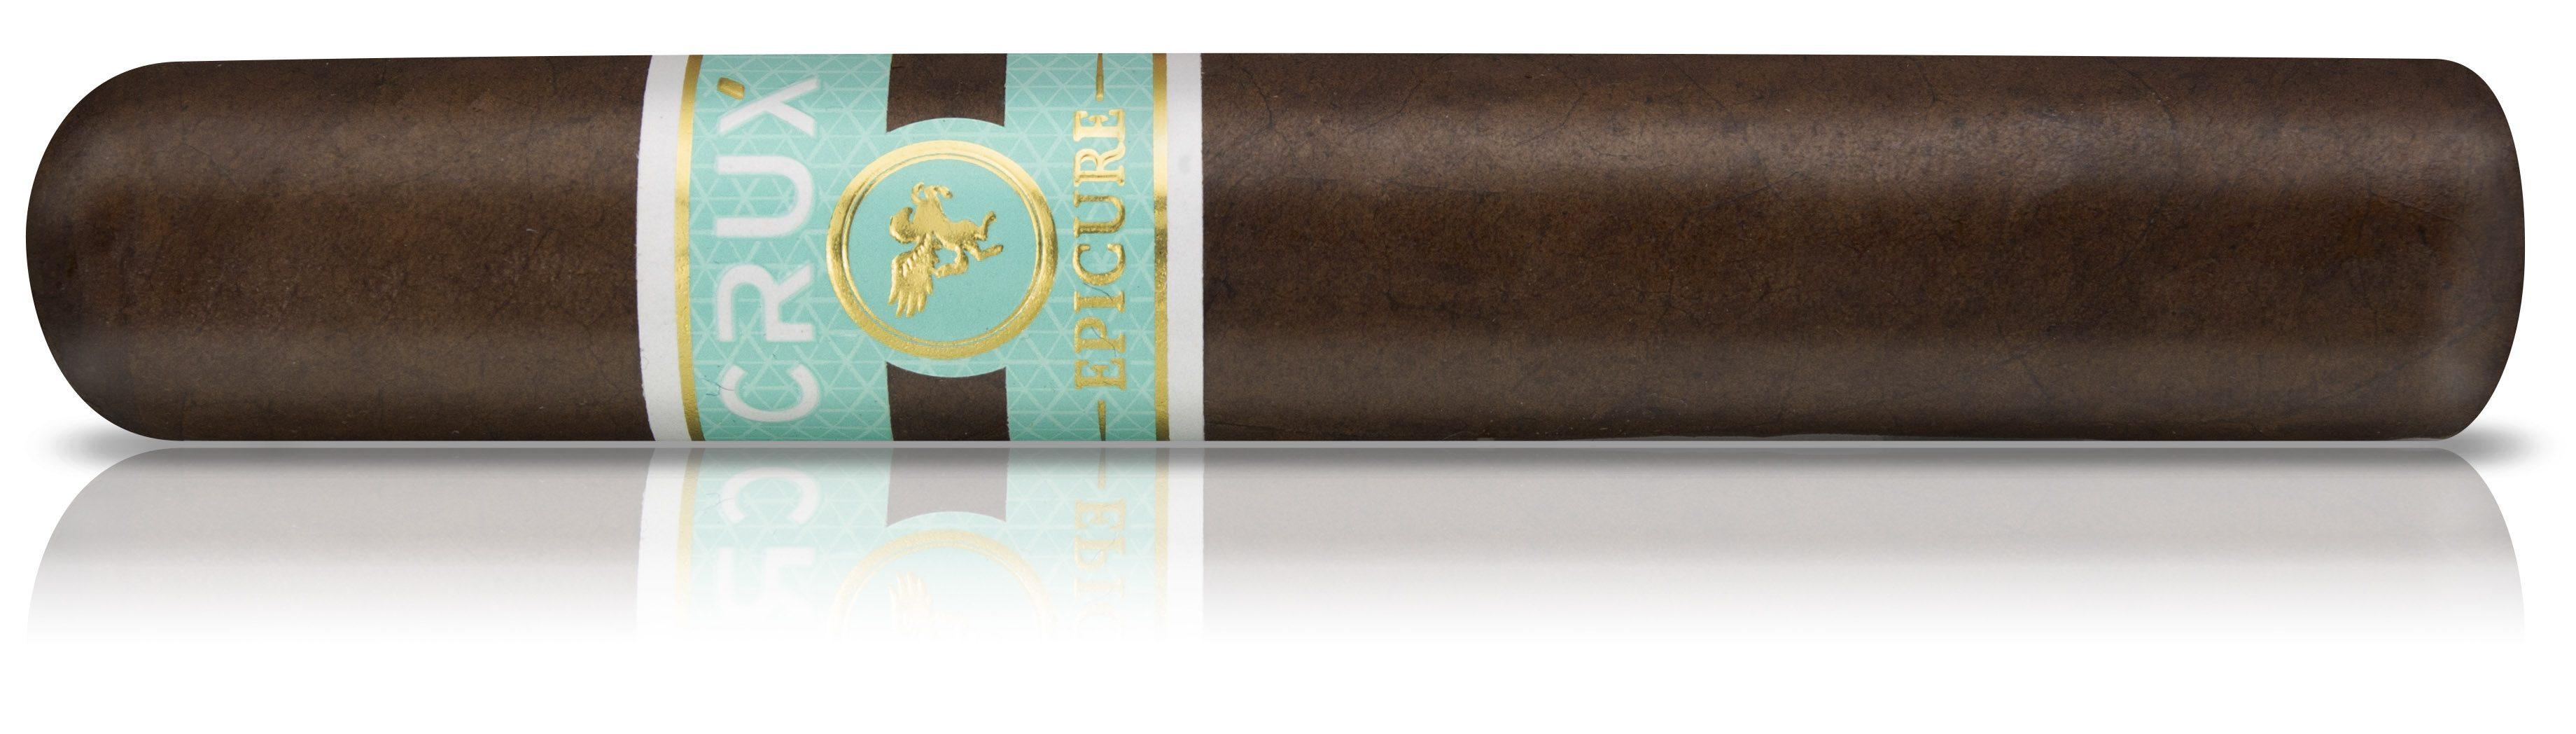 horizontal crux epicure maduro cigar